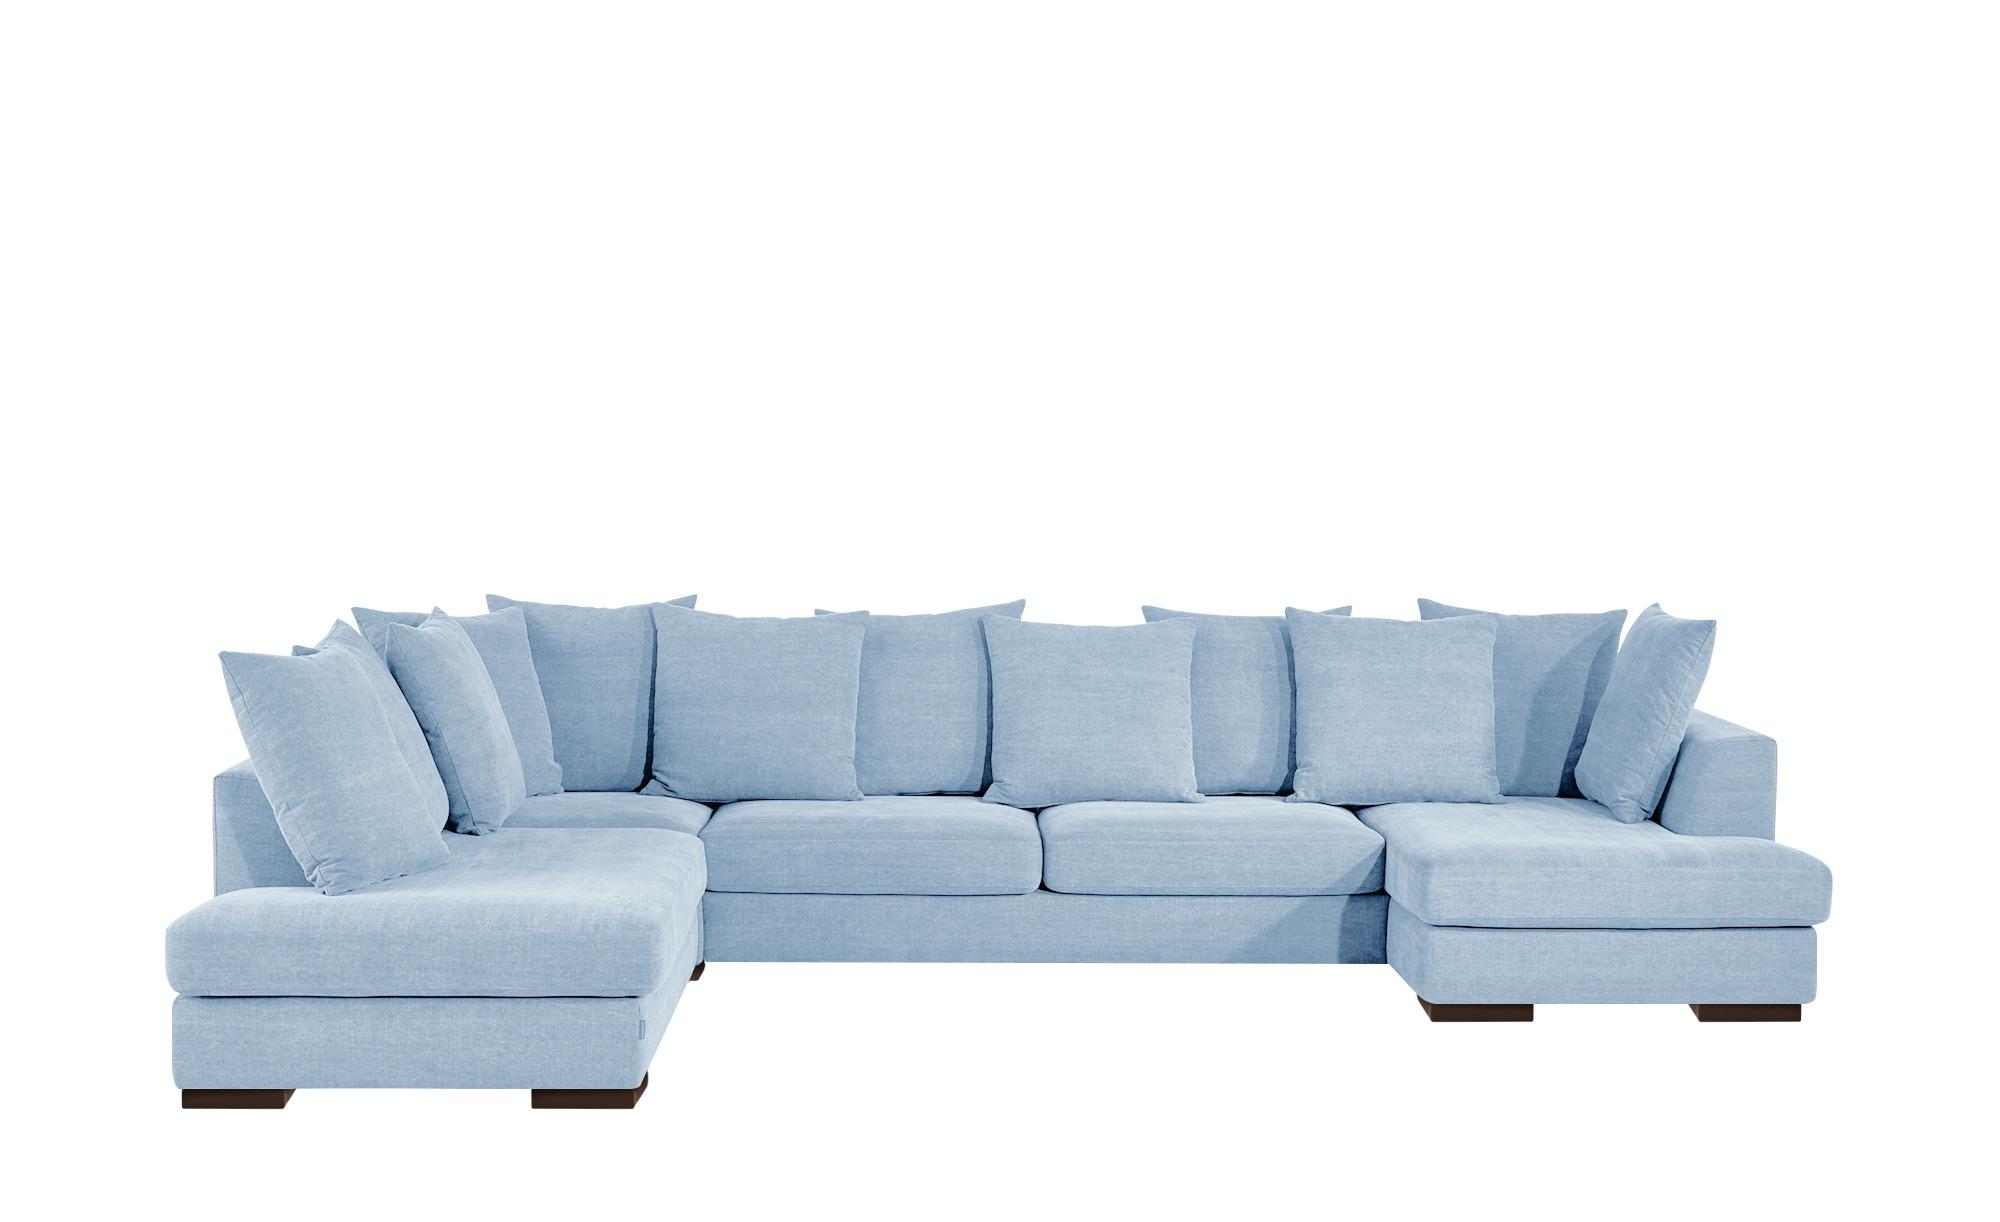 SOHO Wohnlandschaft hellblau - Flachgewebe Paulina ¦ blau ¦ Maße (cm): B: 386 T: 156 Polstermöbel > Sofas > Wohnlandschaften - Höffner